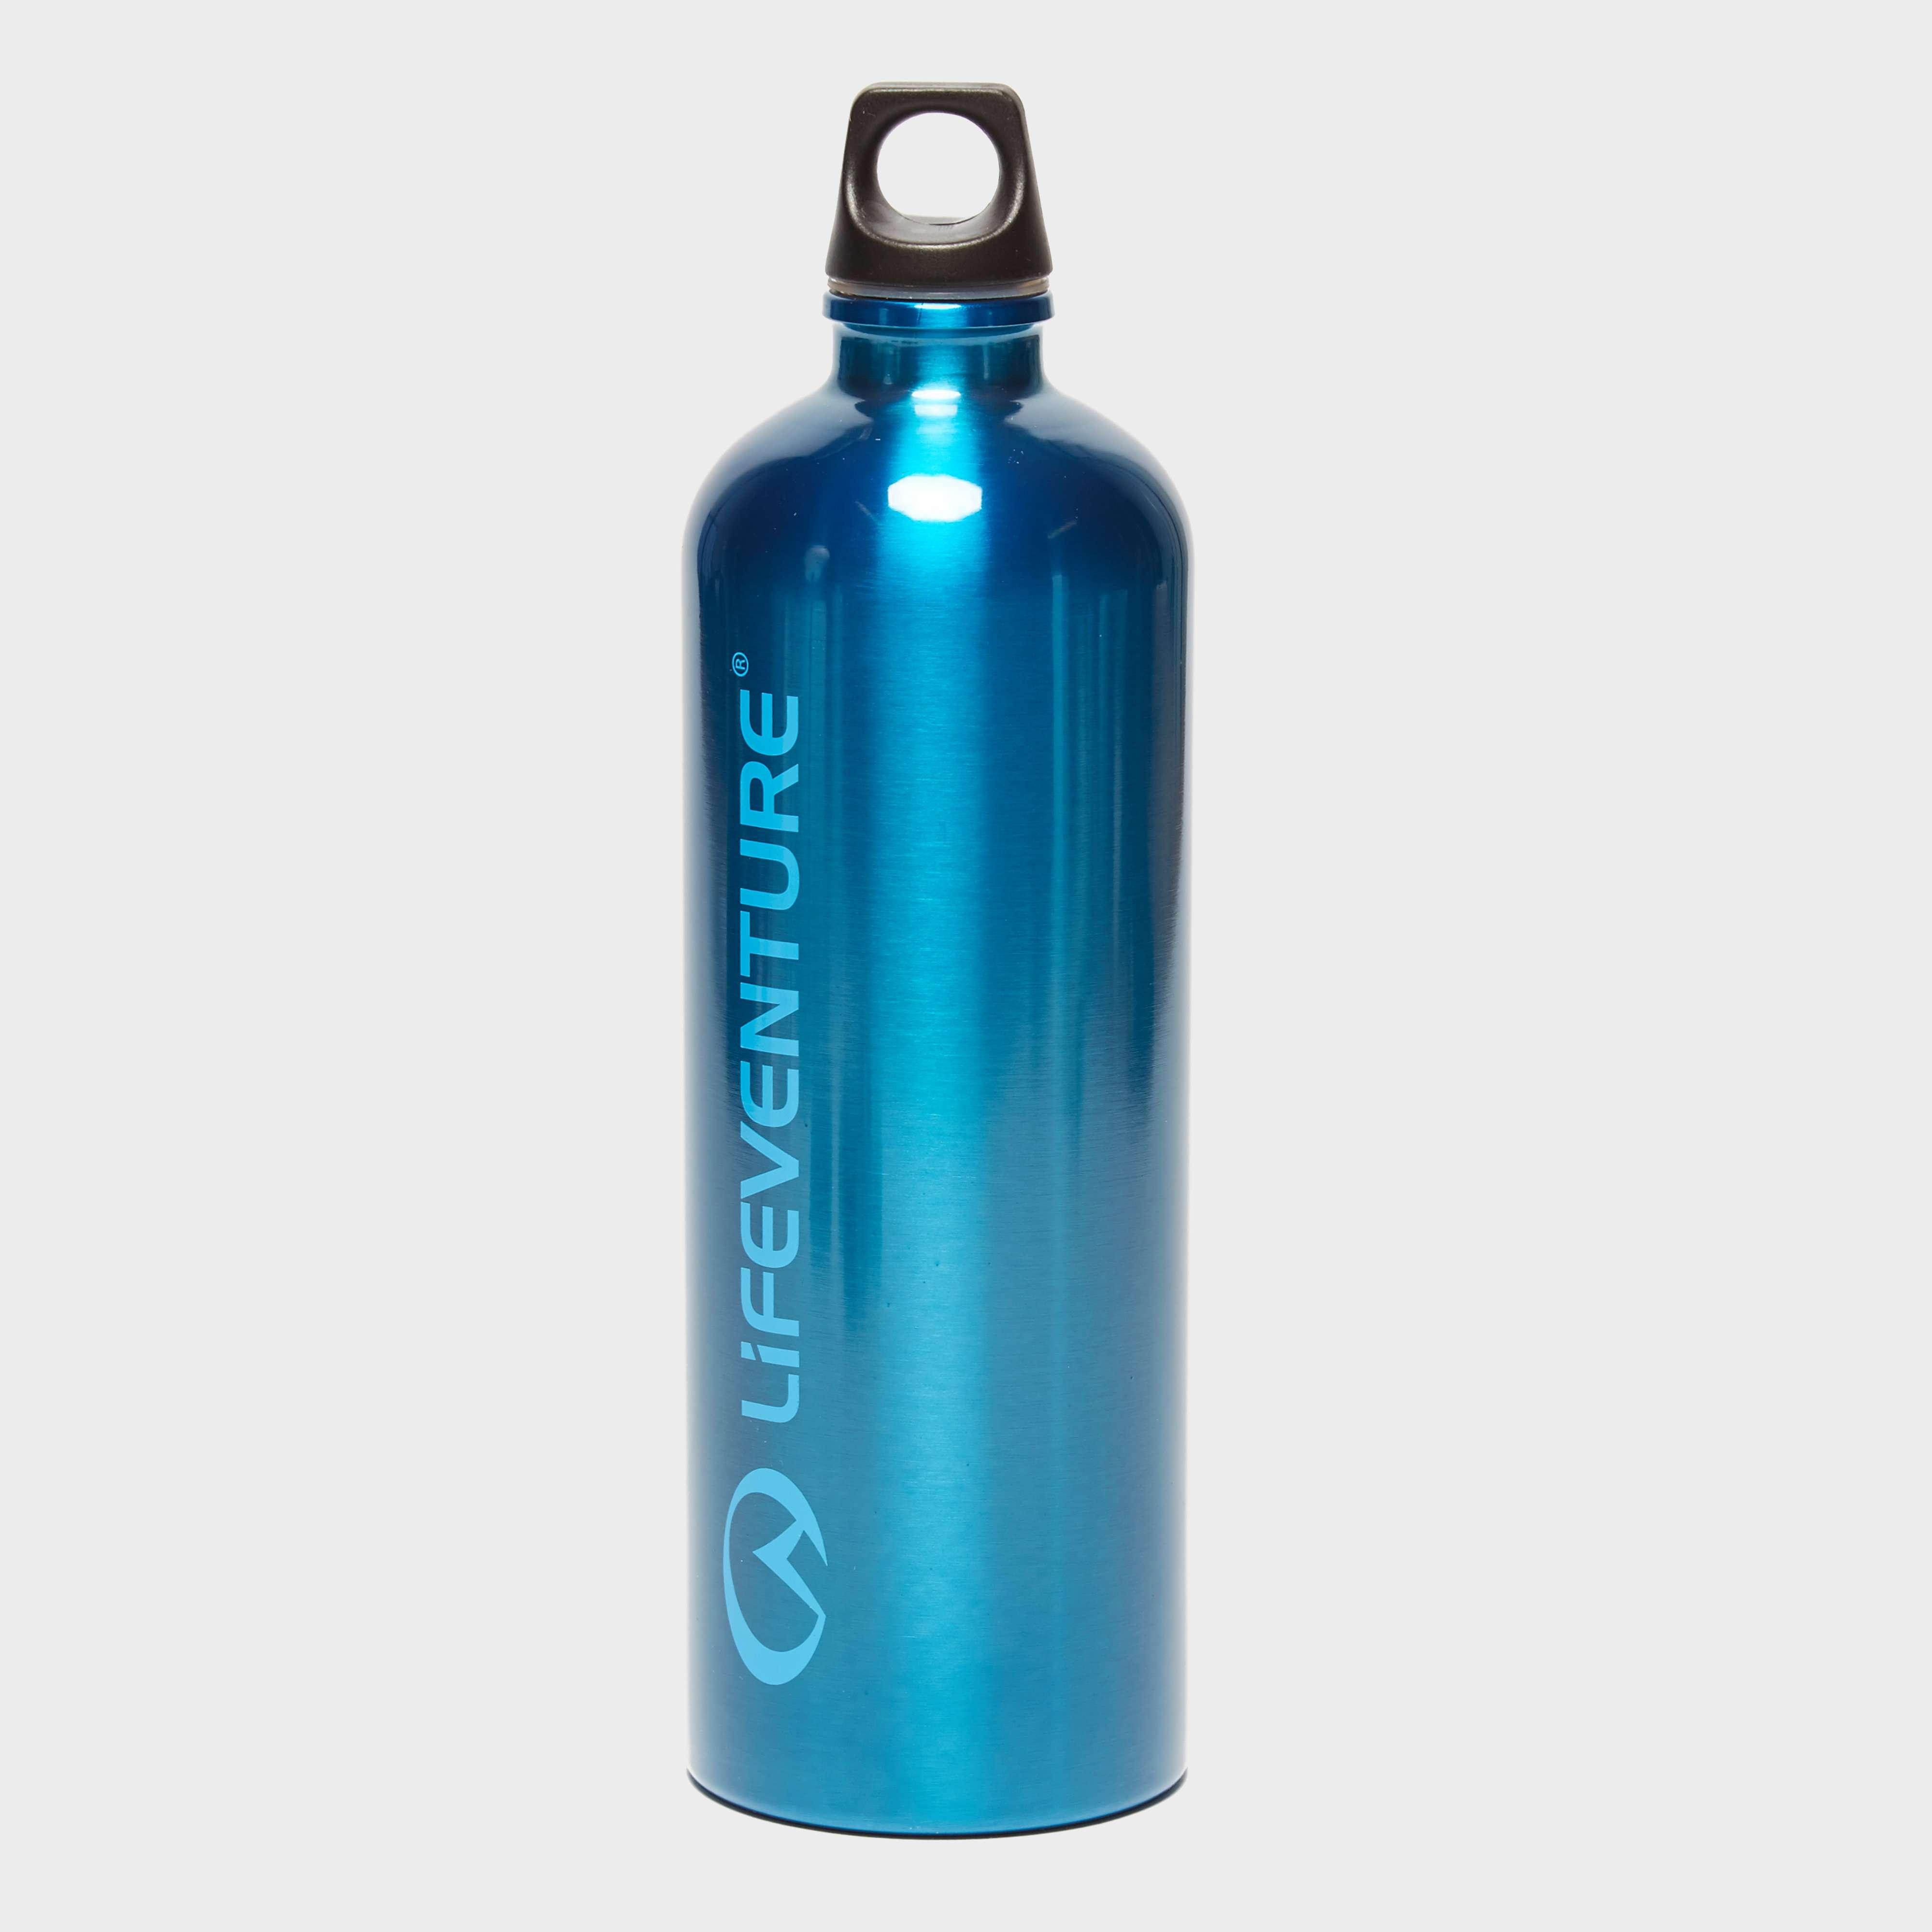 LIFEVENTURE Stainless Steel 1L Bottle